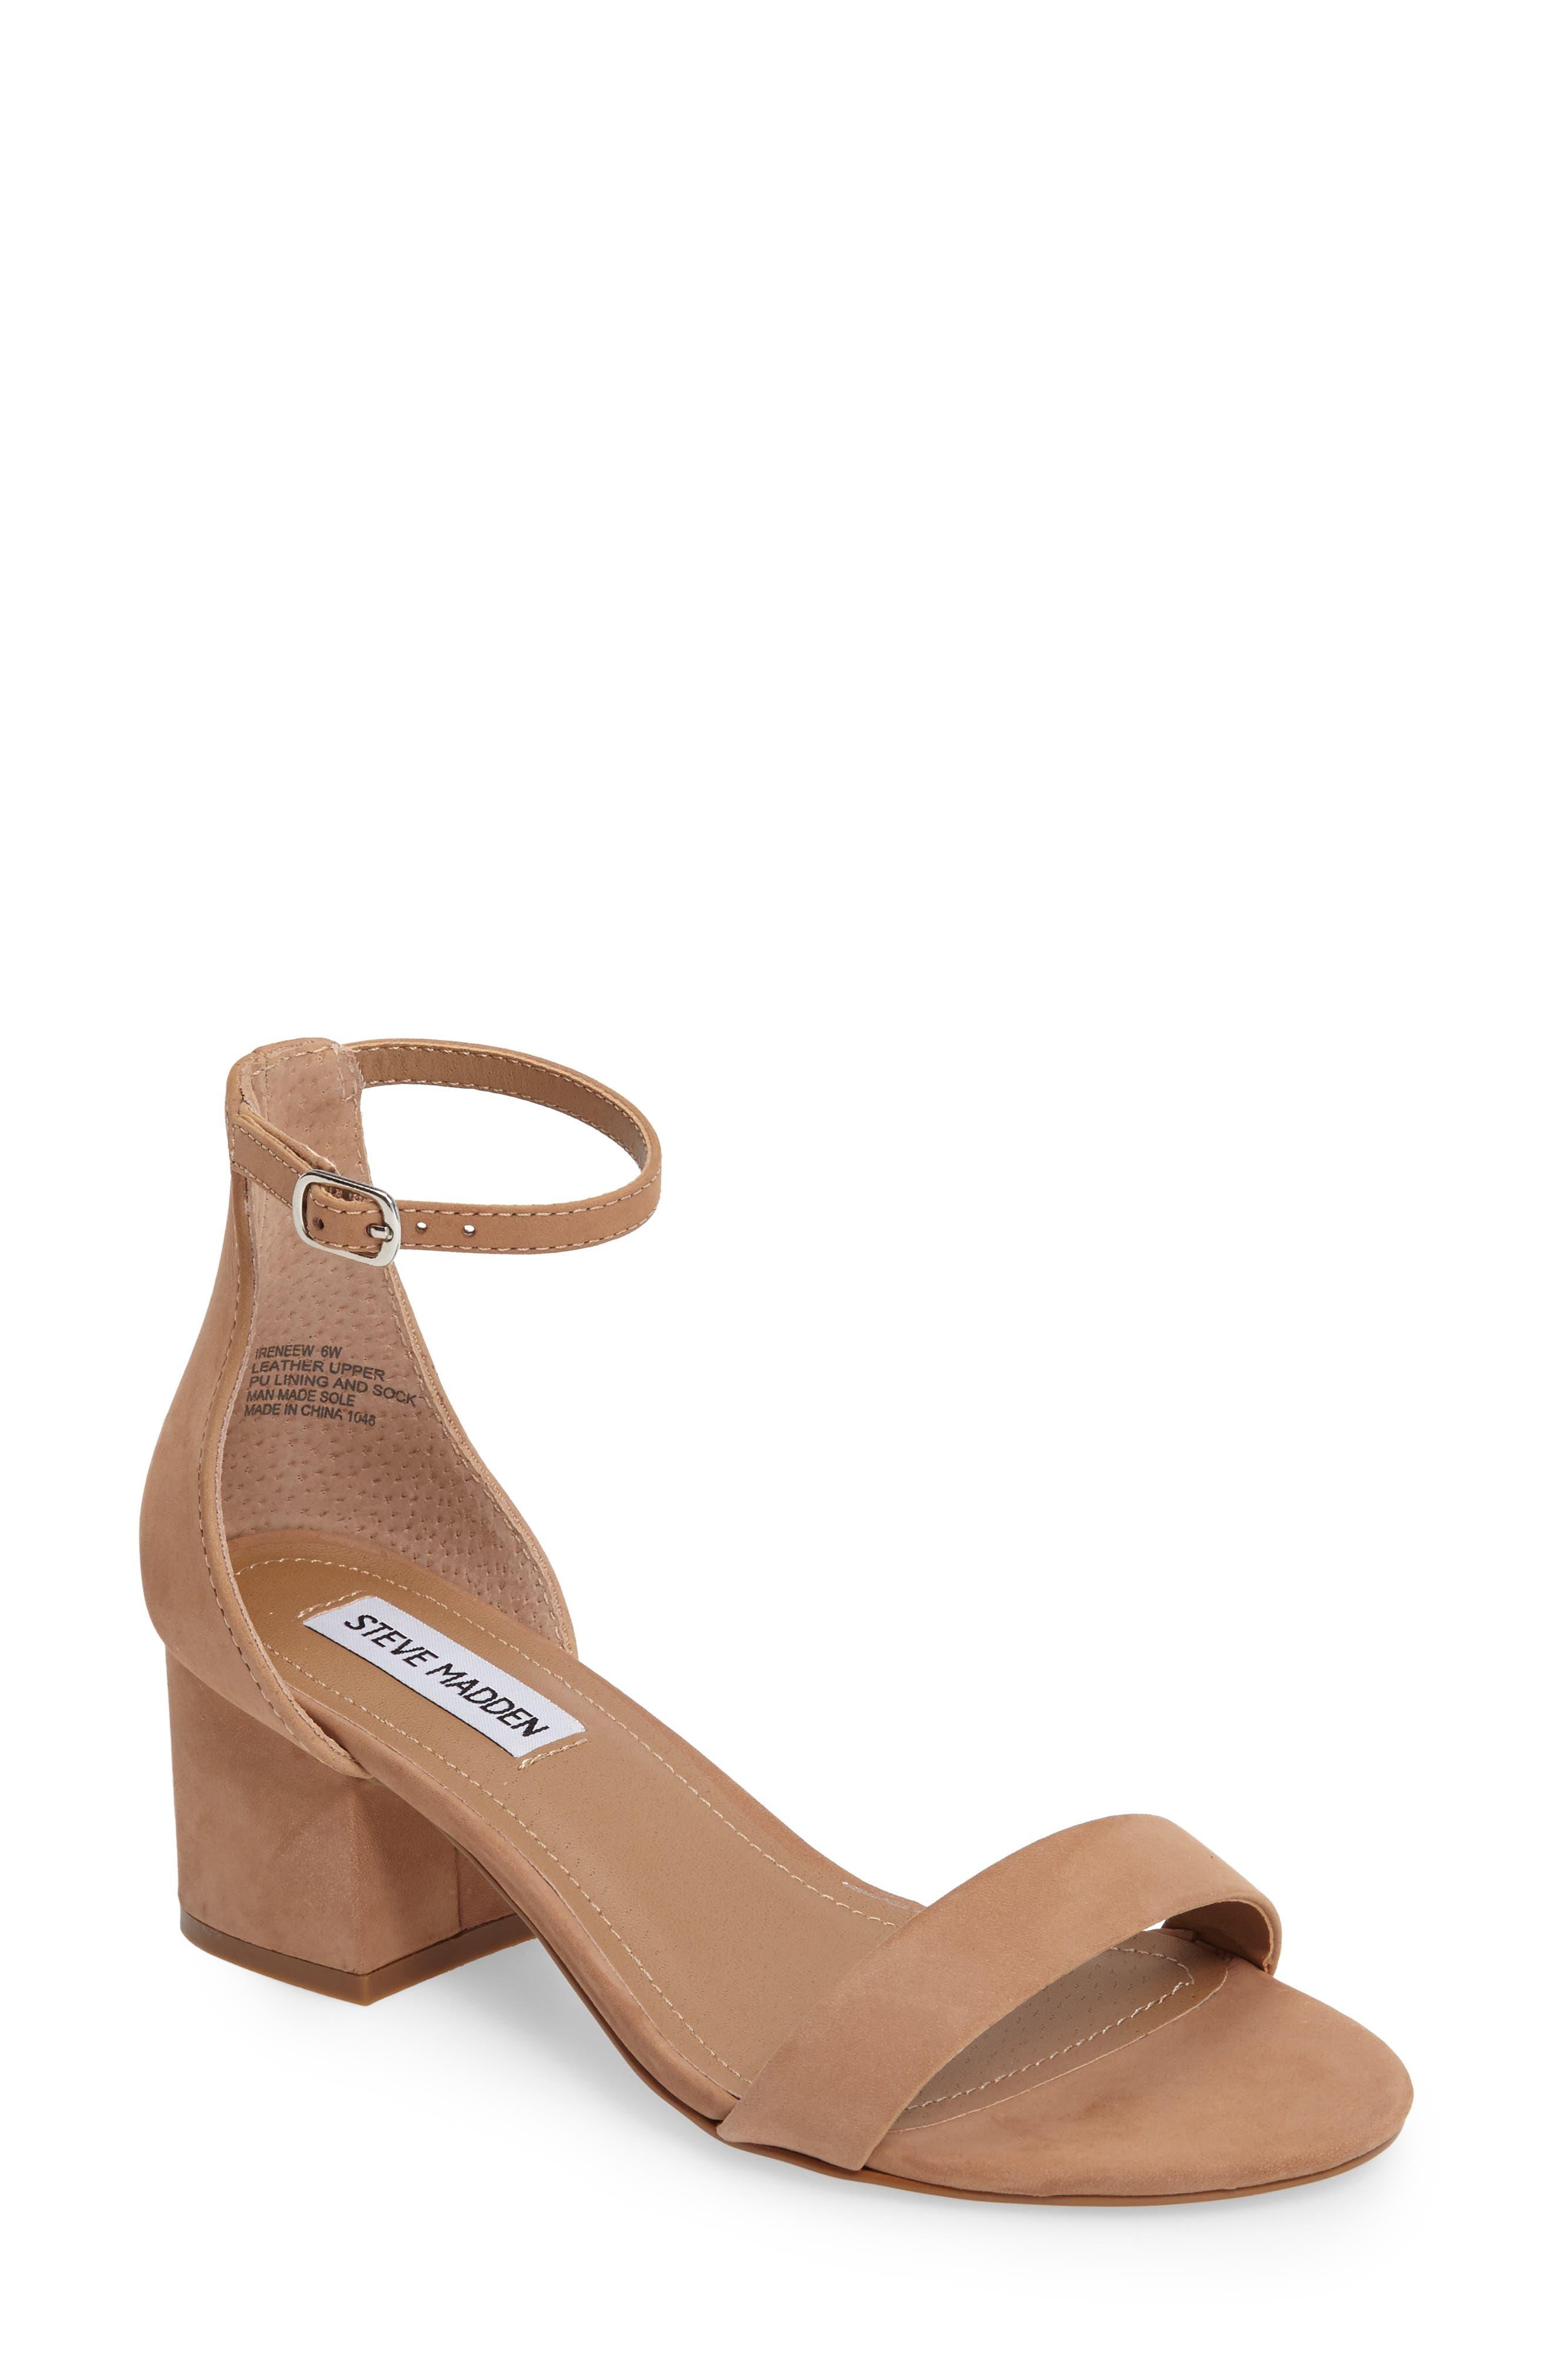 Irenee Ankle Strap Sandal,                             Main thumbnail 20, color,